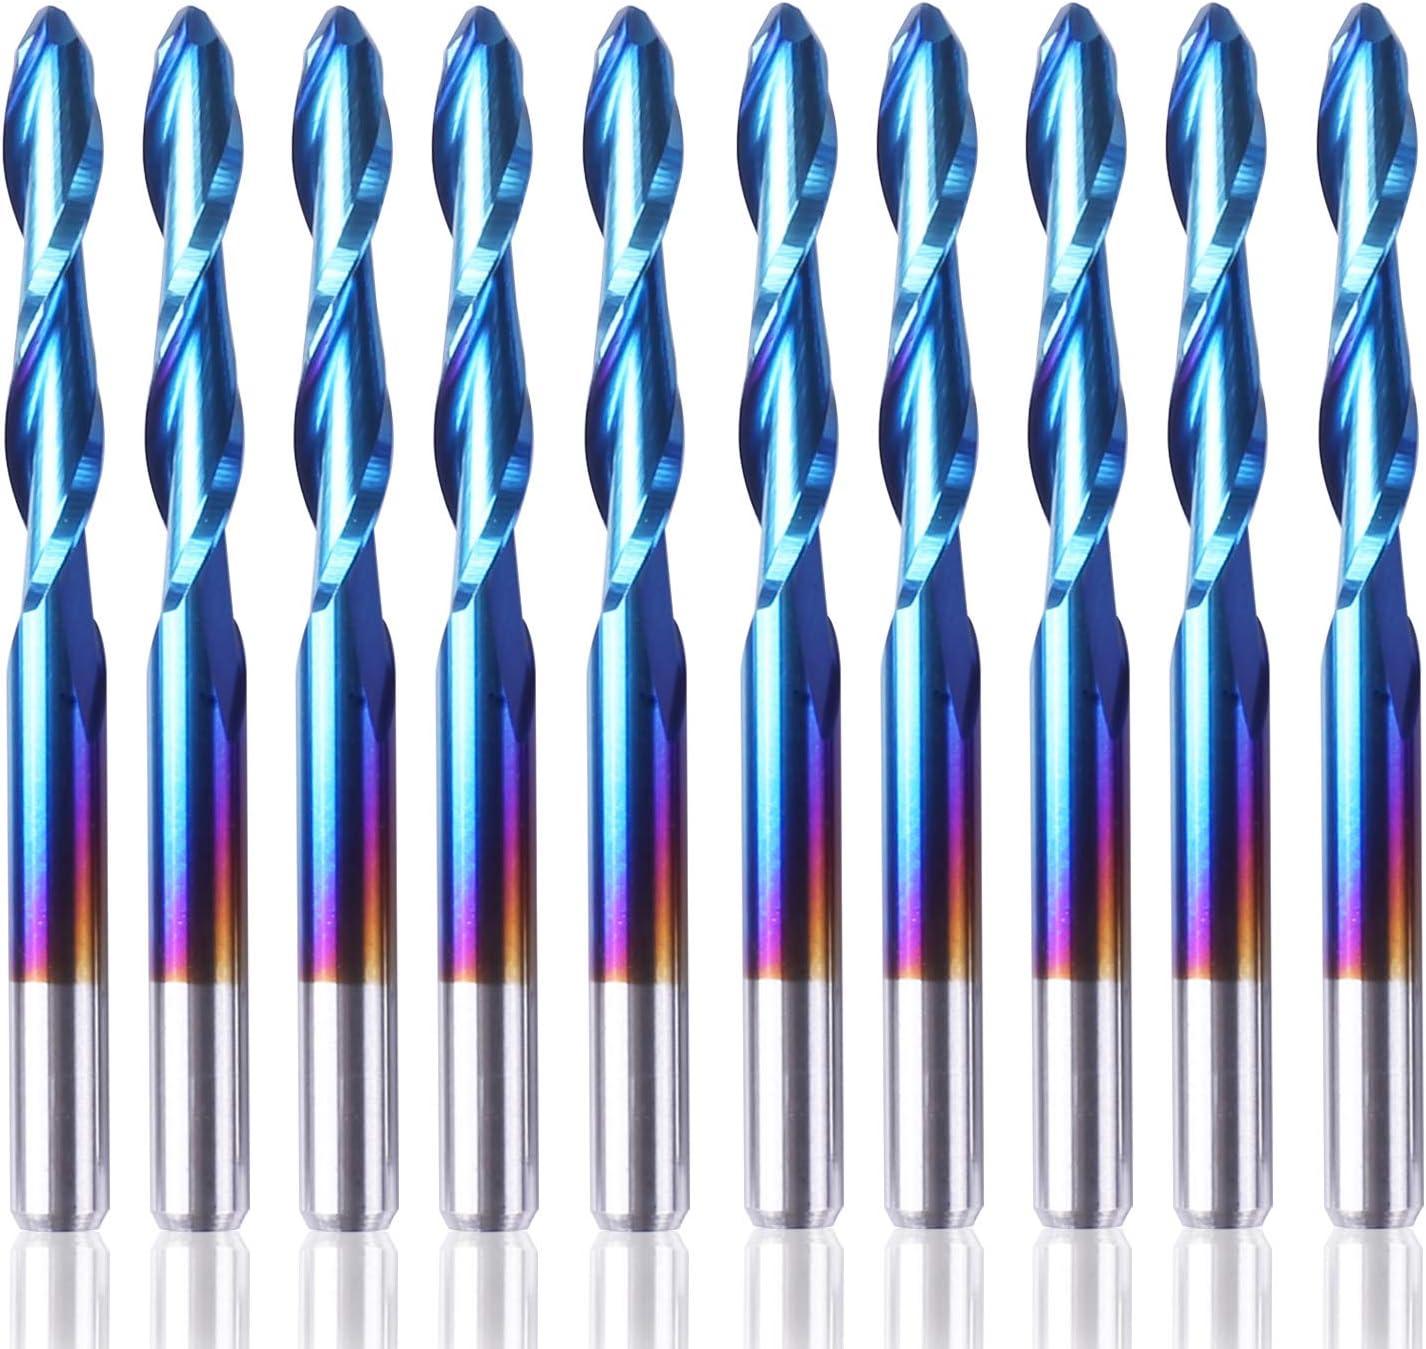 3.175 x 17 x 38mm SainSmart Genmitsu 10Pcs Nano Blue Coat Flat Nose End Mill CNC Router Bits 1//8 Shank Spiral Upcut 2 Flute End Mill Set